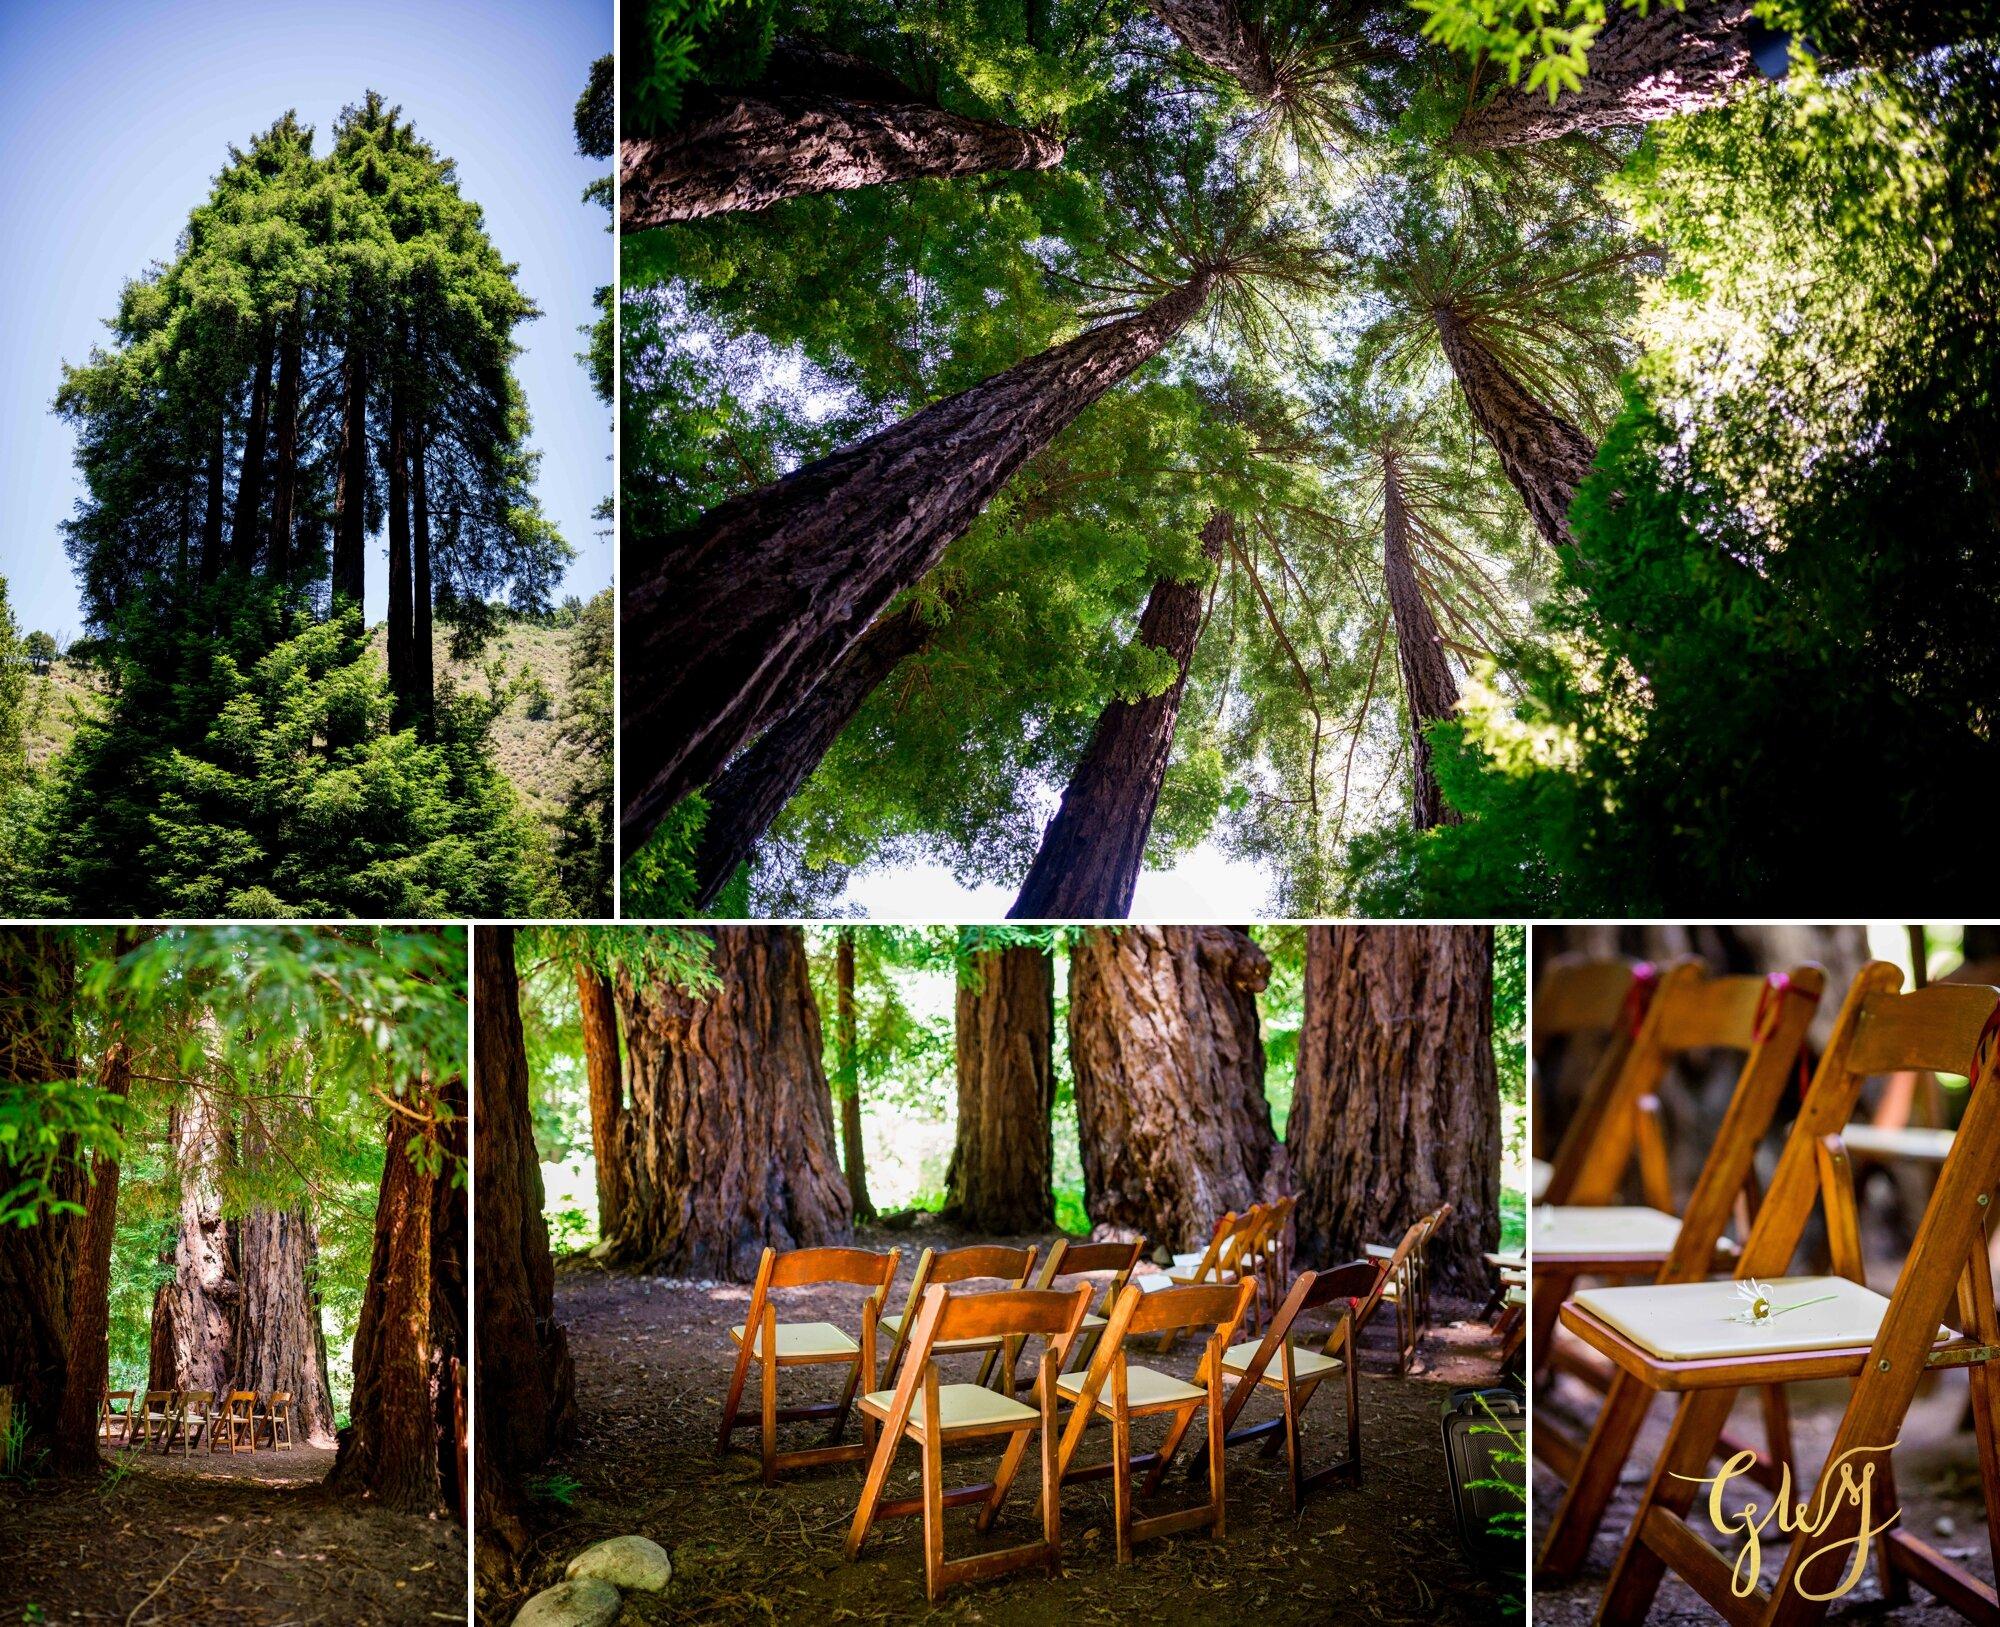 Casey + Jordan's Intimate Big Sur Elopement in the Redwoods by Glass Woods Media 30.jpg